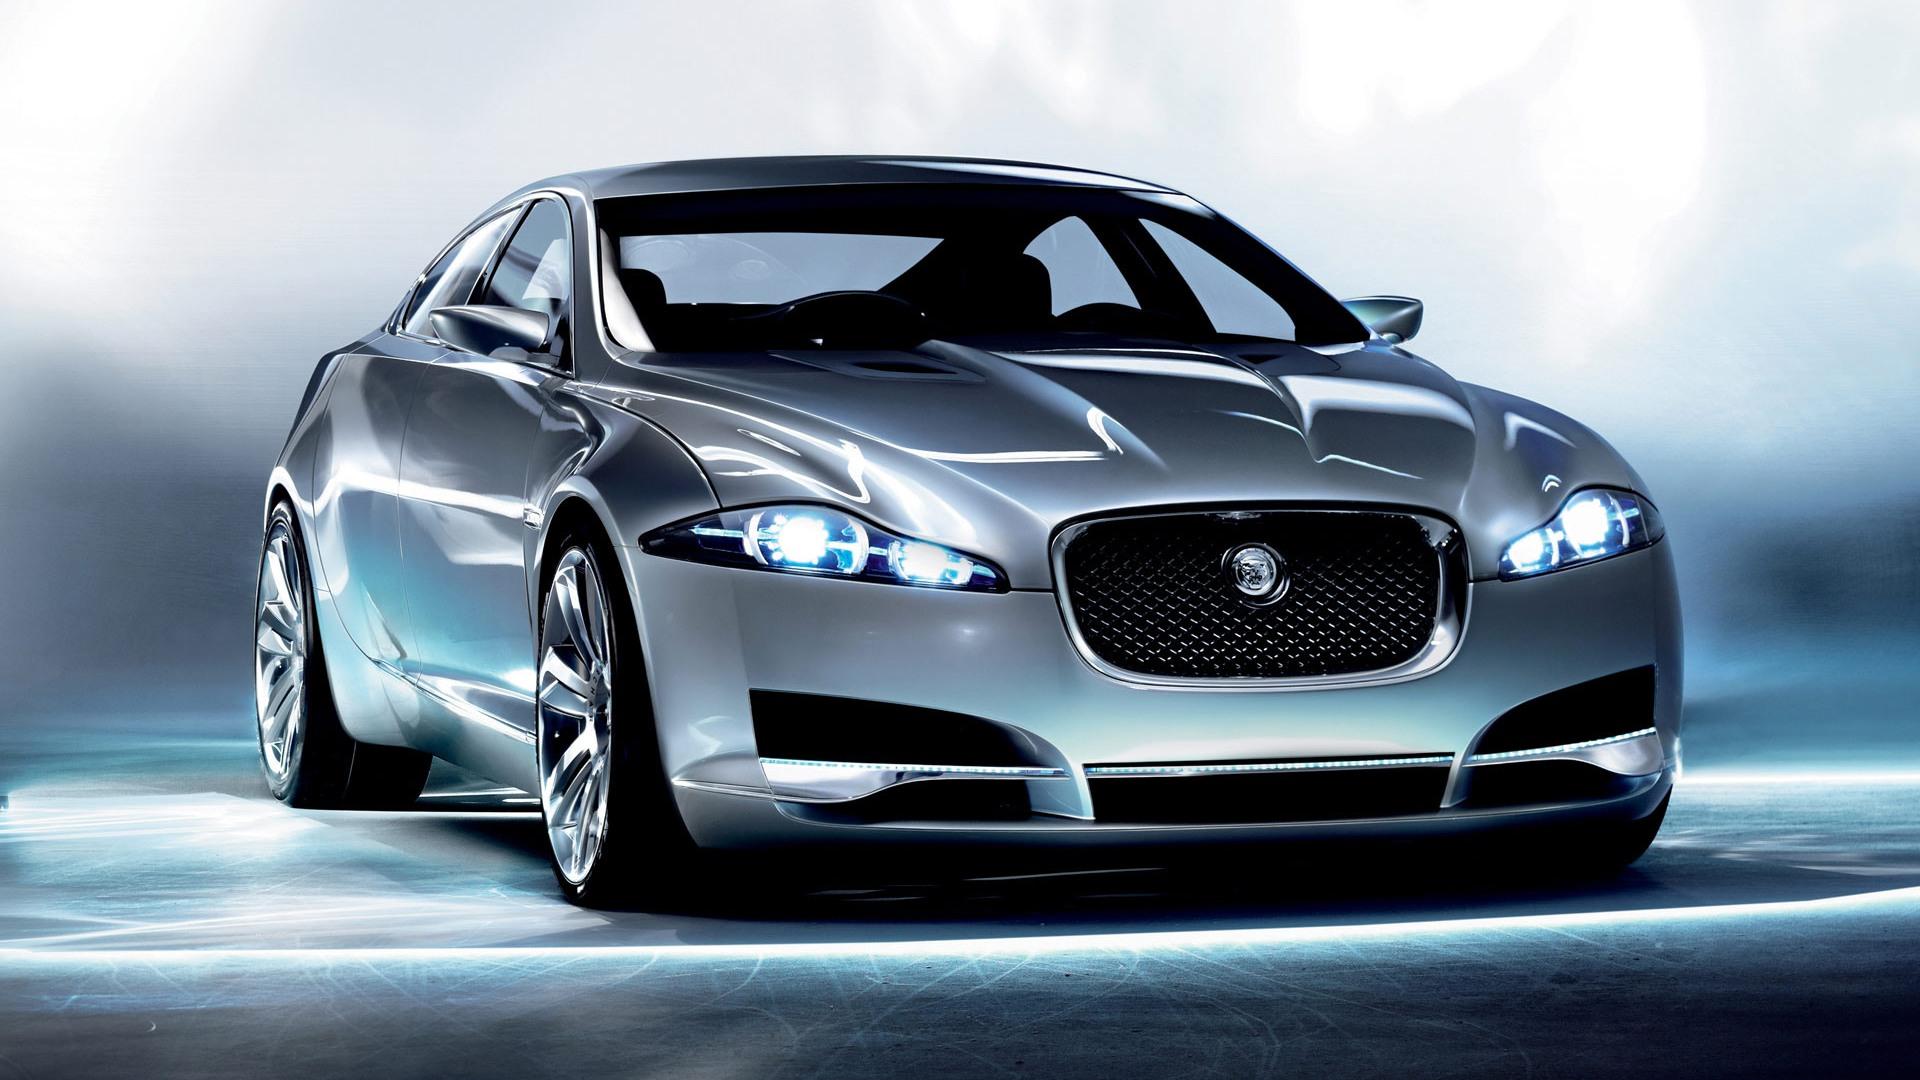 Jaguar, x351, luxury, sports, car - WallpapersPics